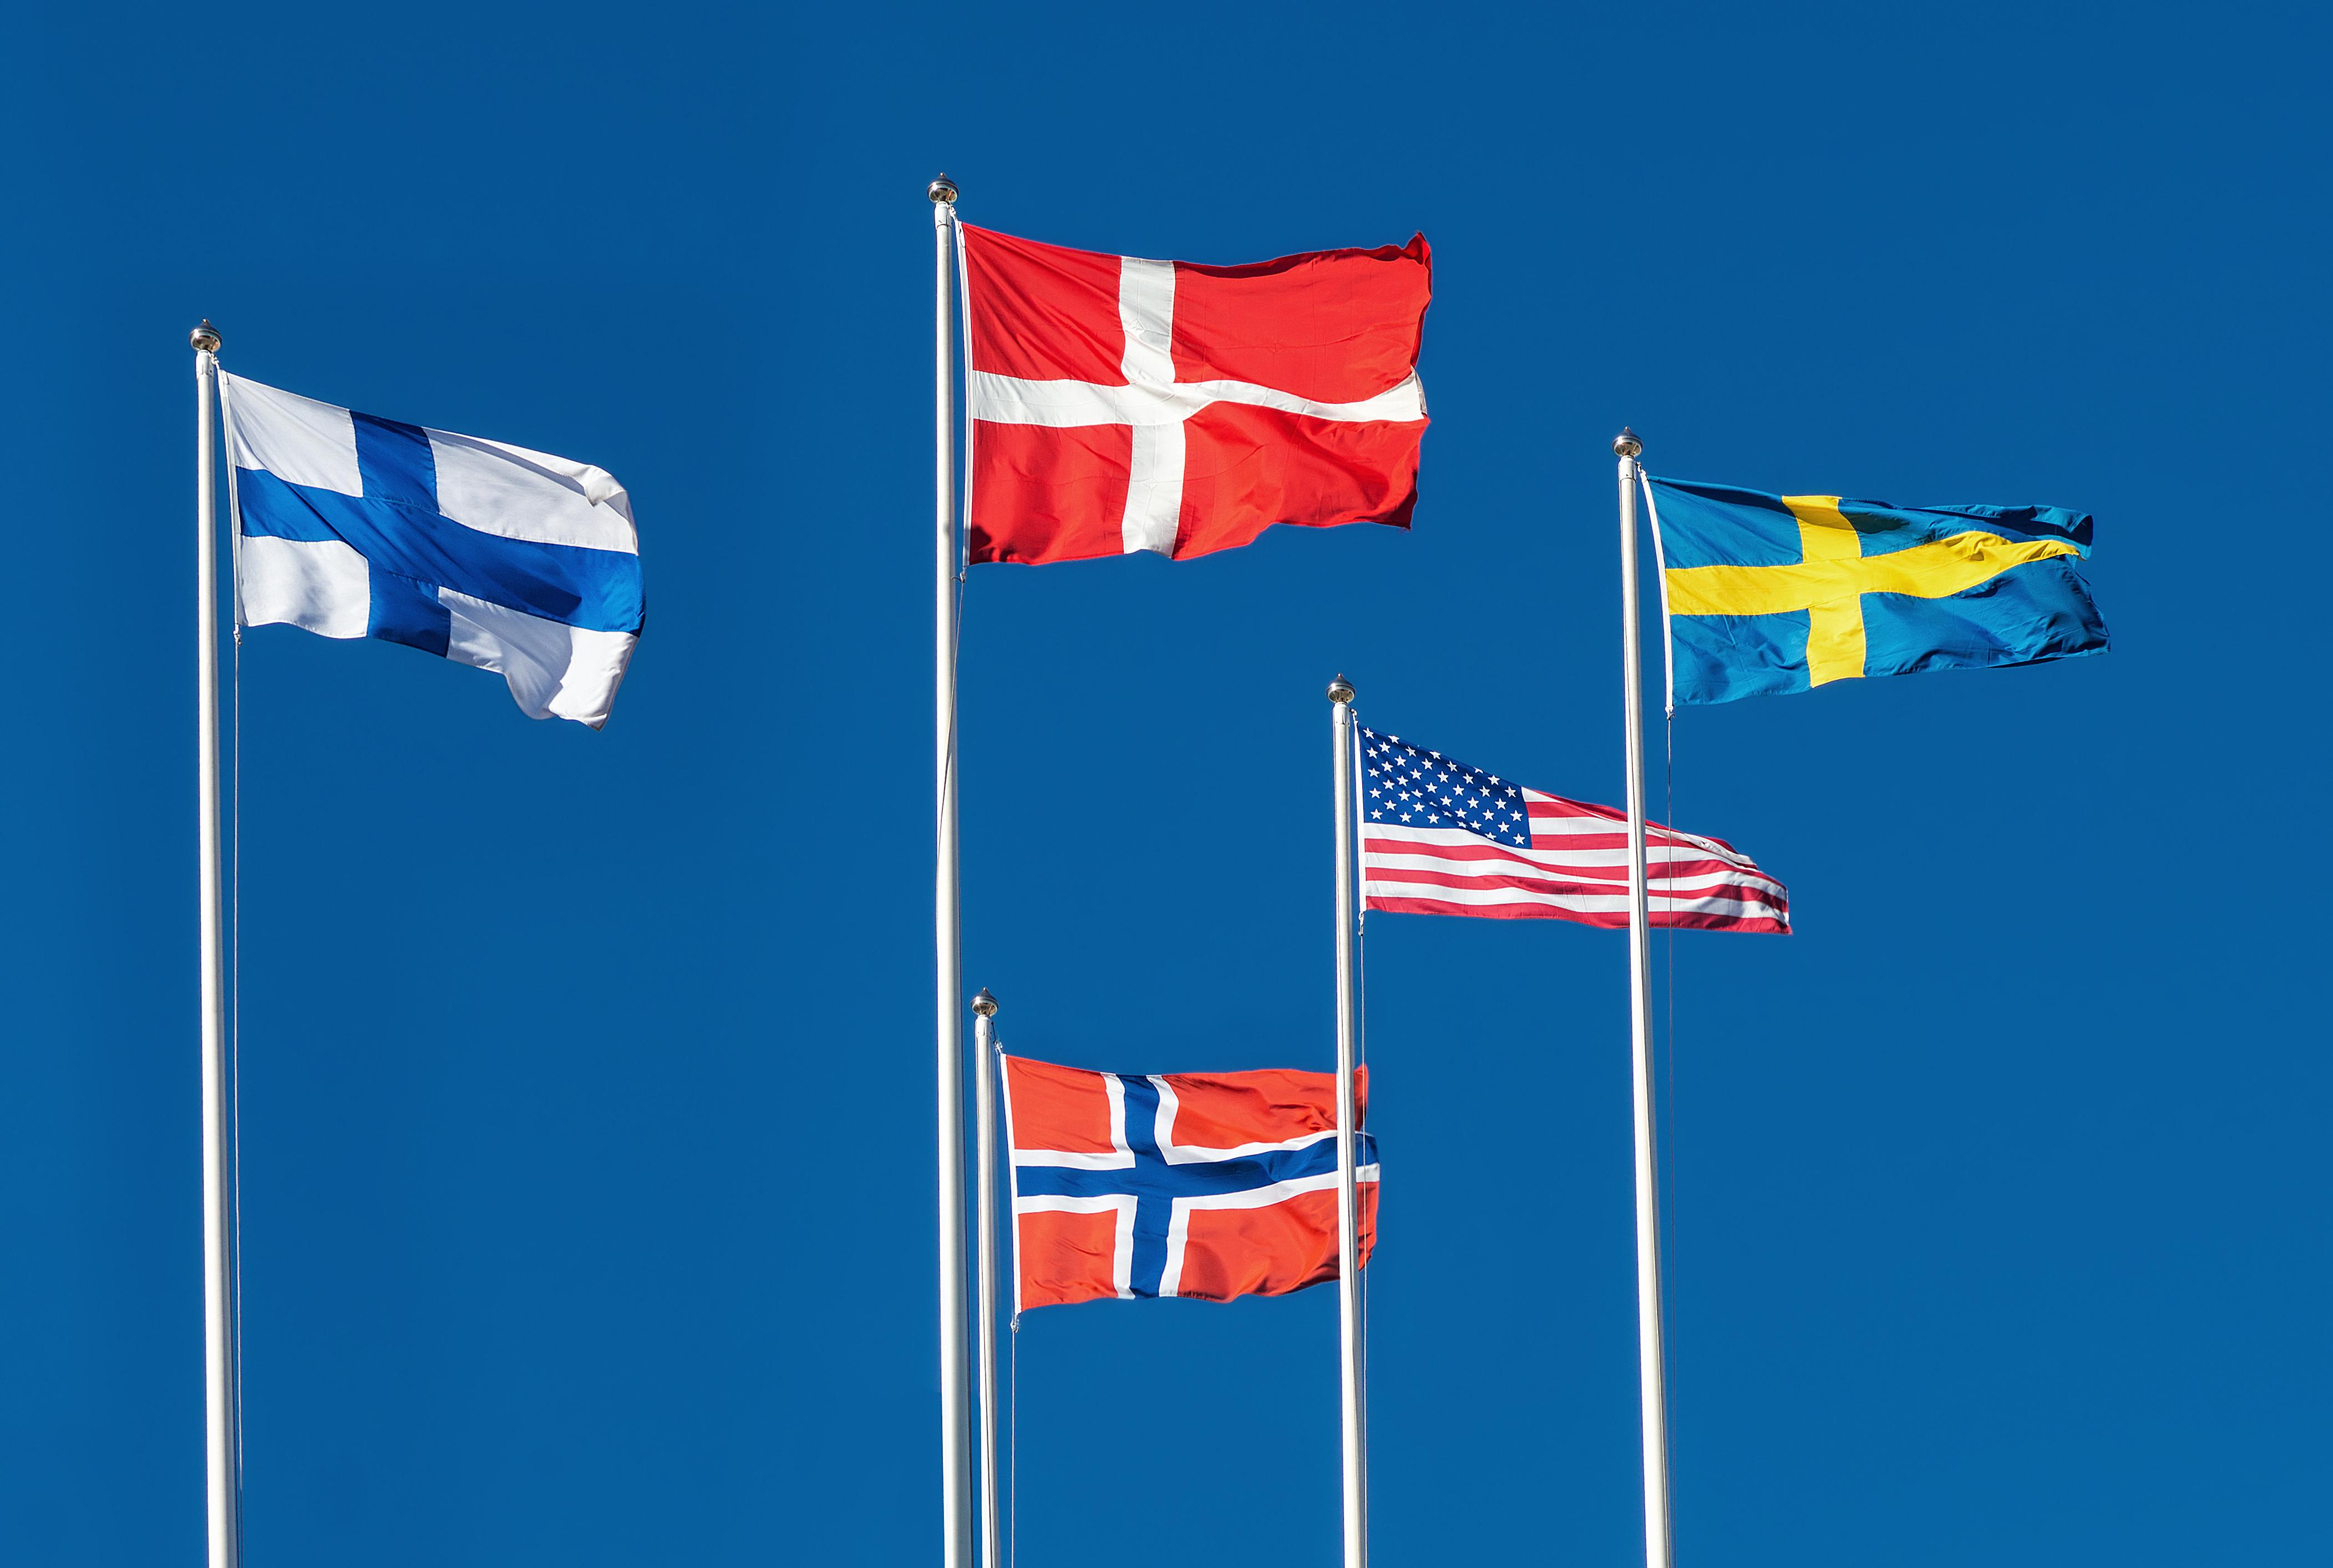 Scandinavia is Not Socialist, It Just Soaks the Taxpayer